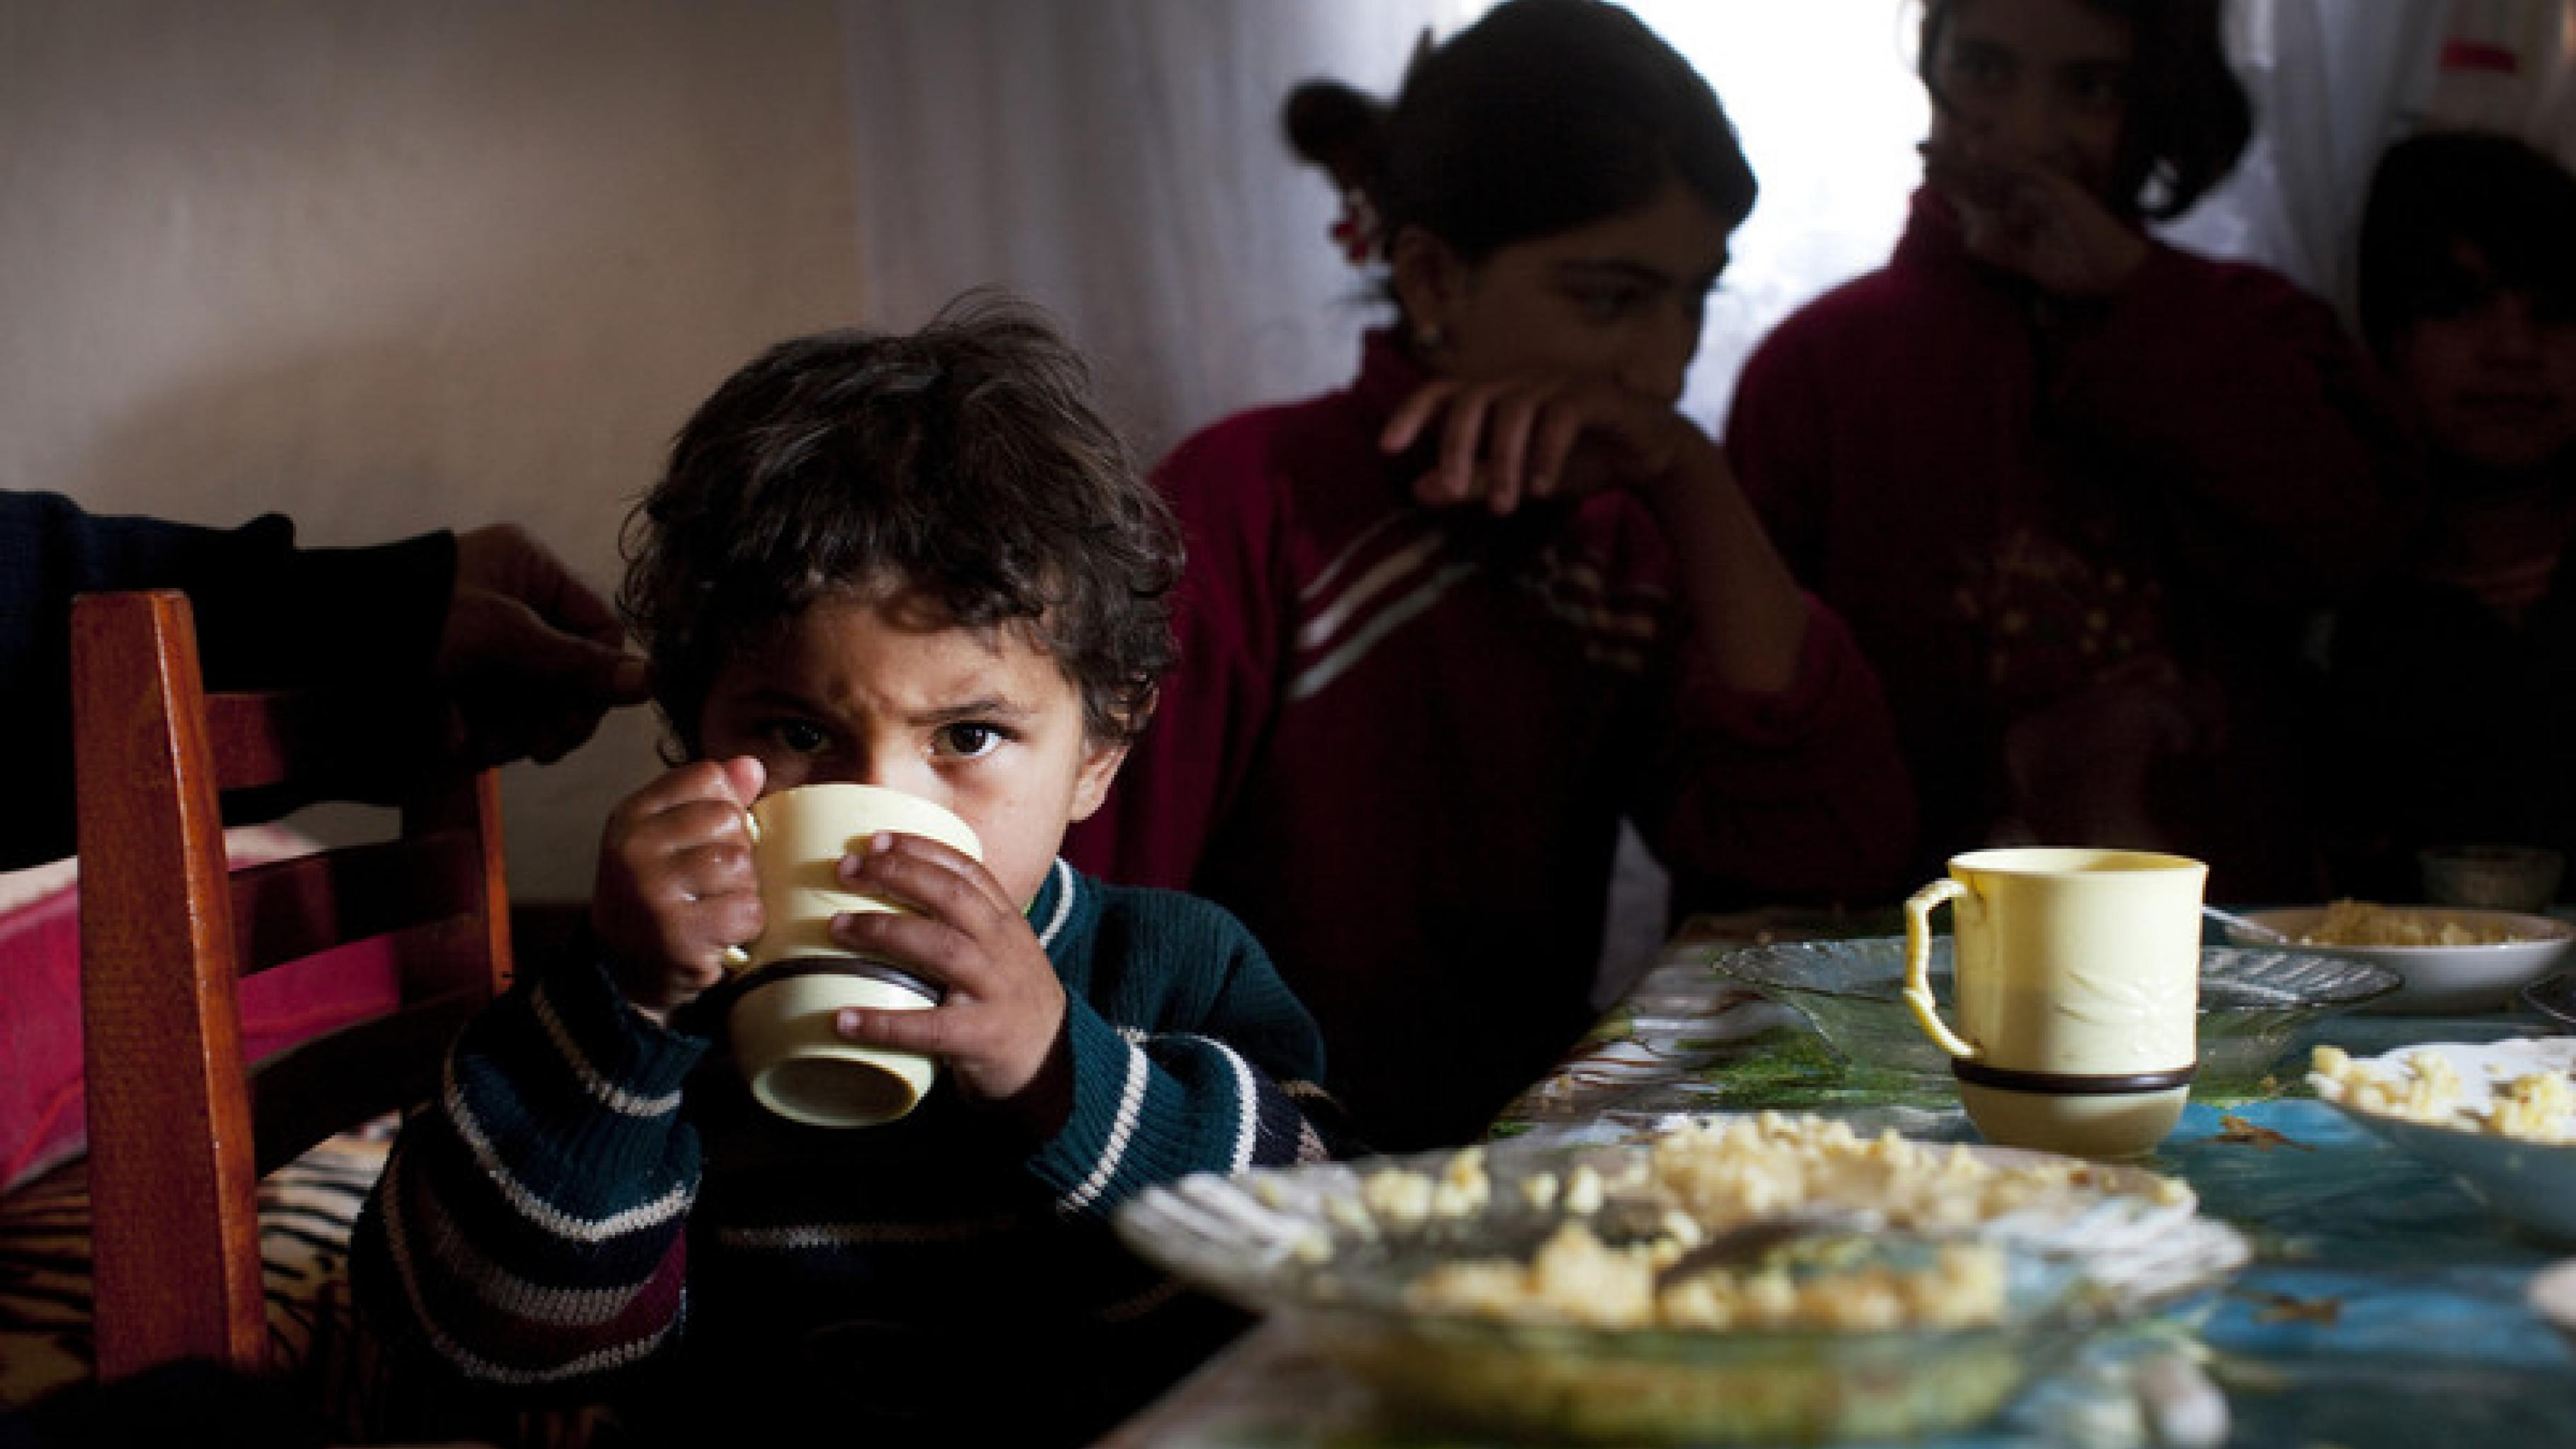 © David Levene/ Oxfam